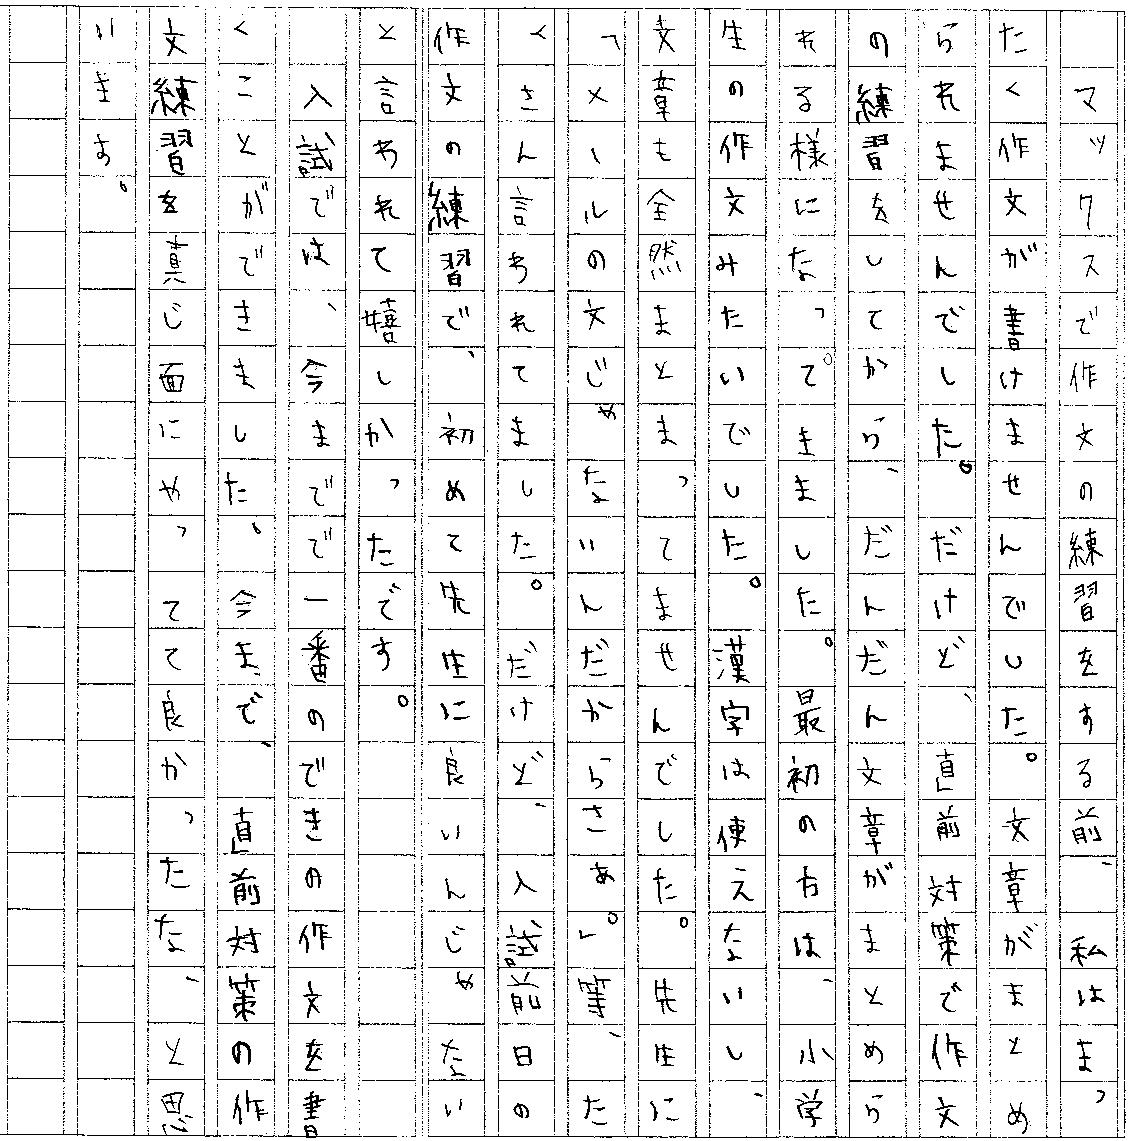 377-1